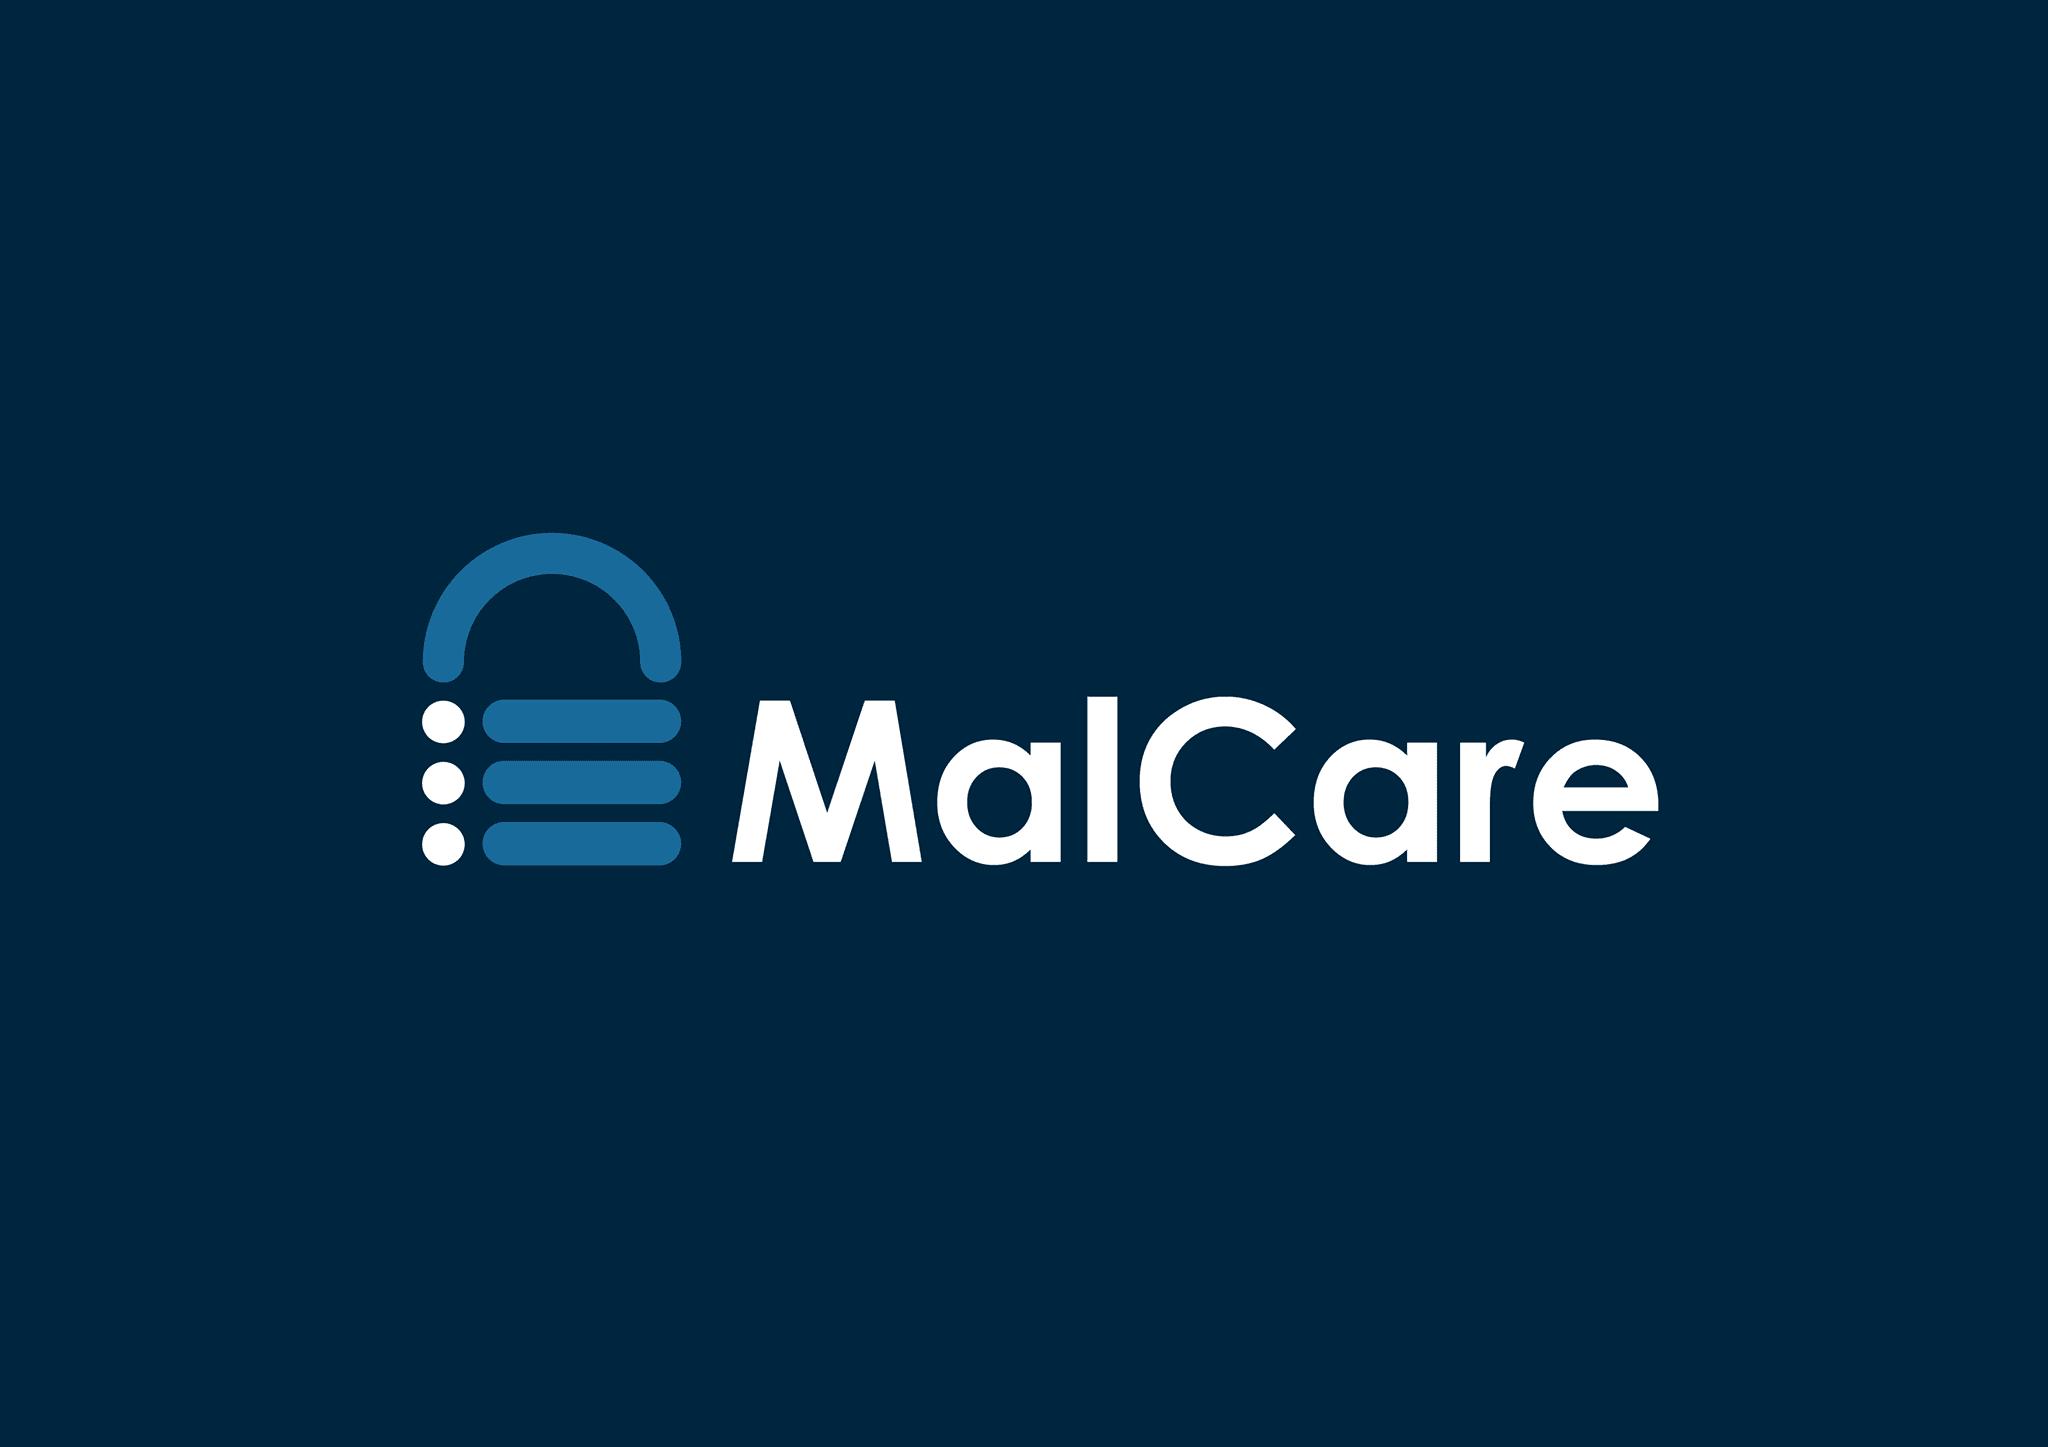 WordPress Malcare security plugin